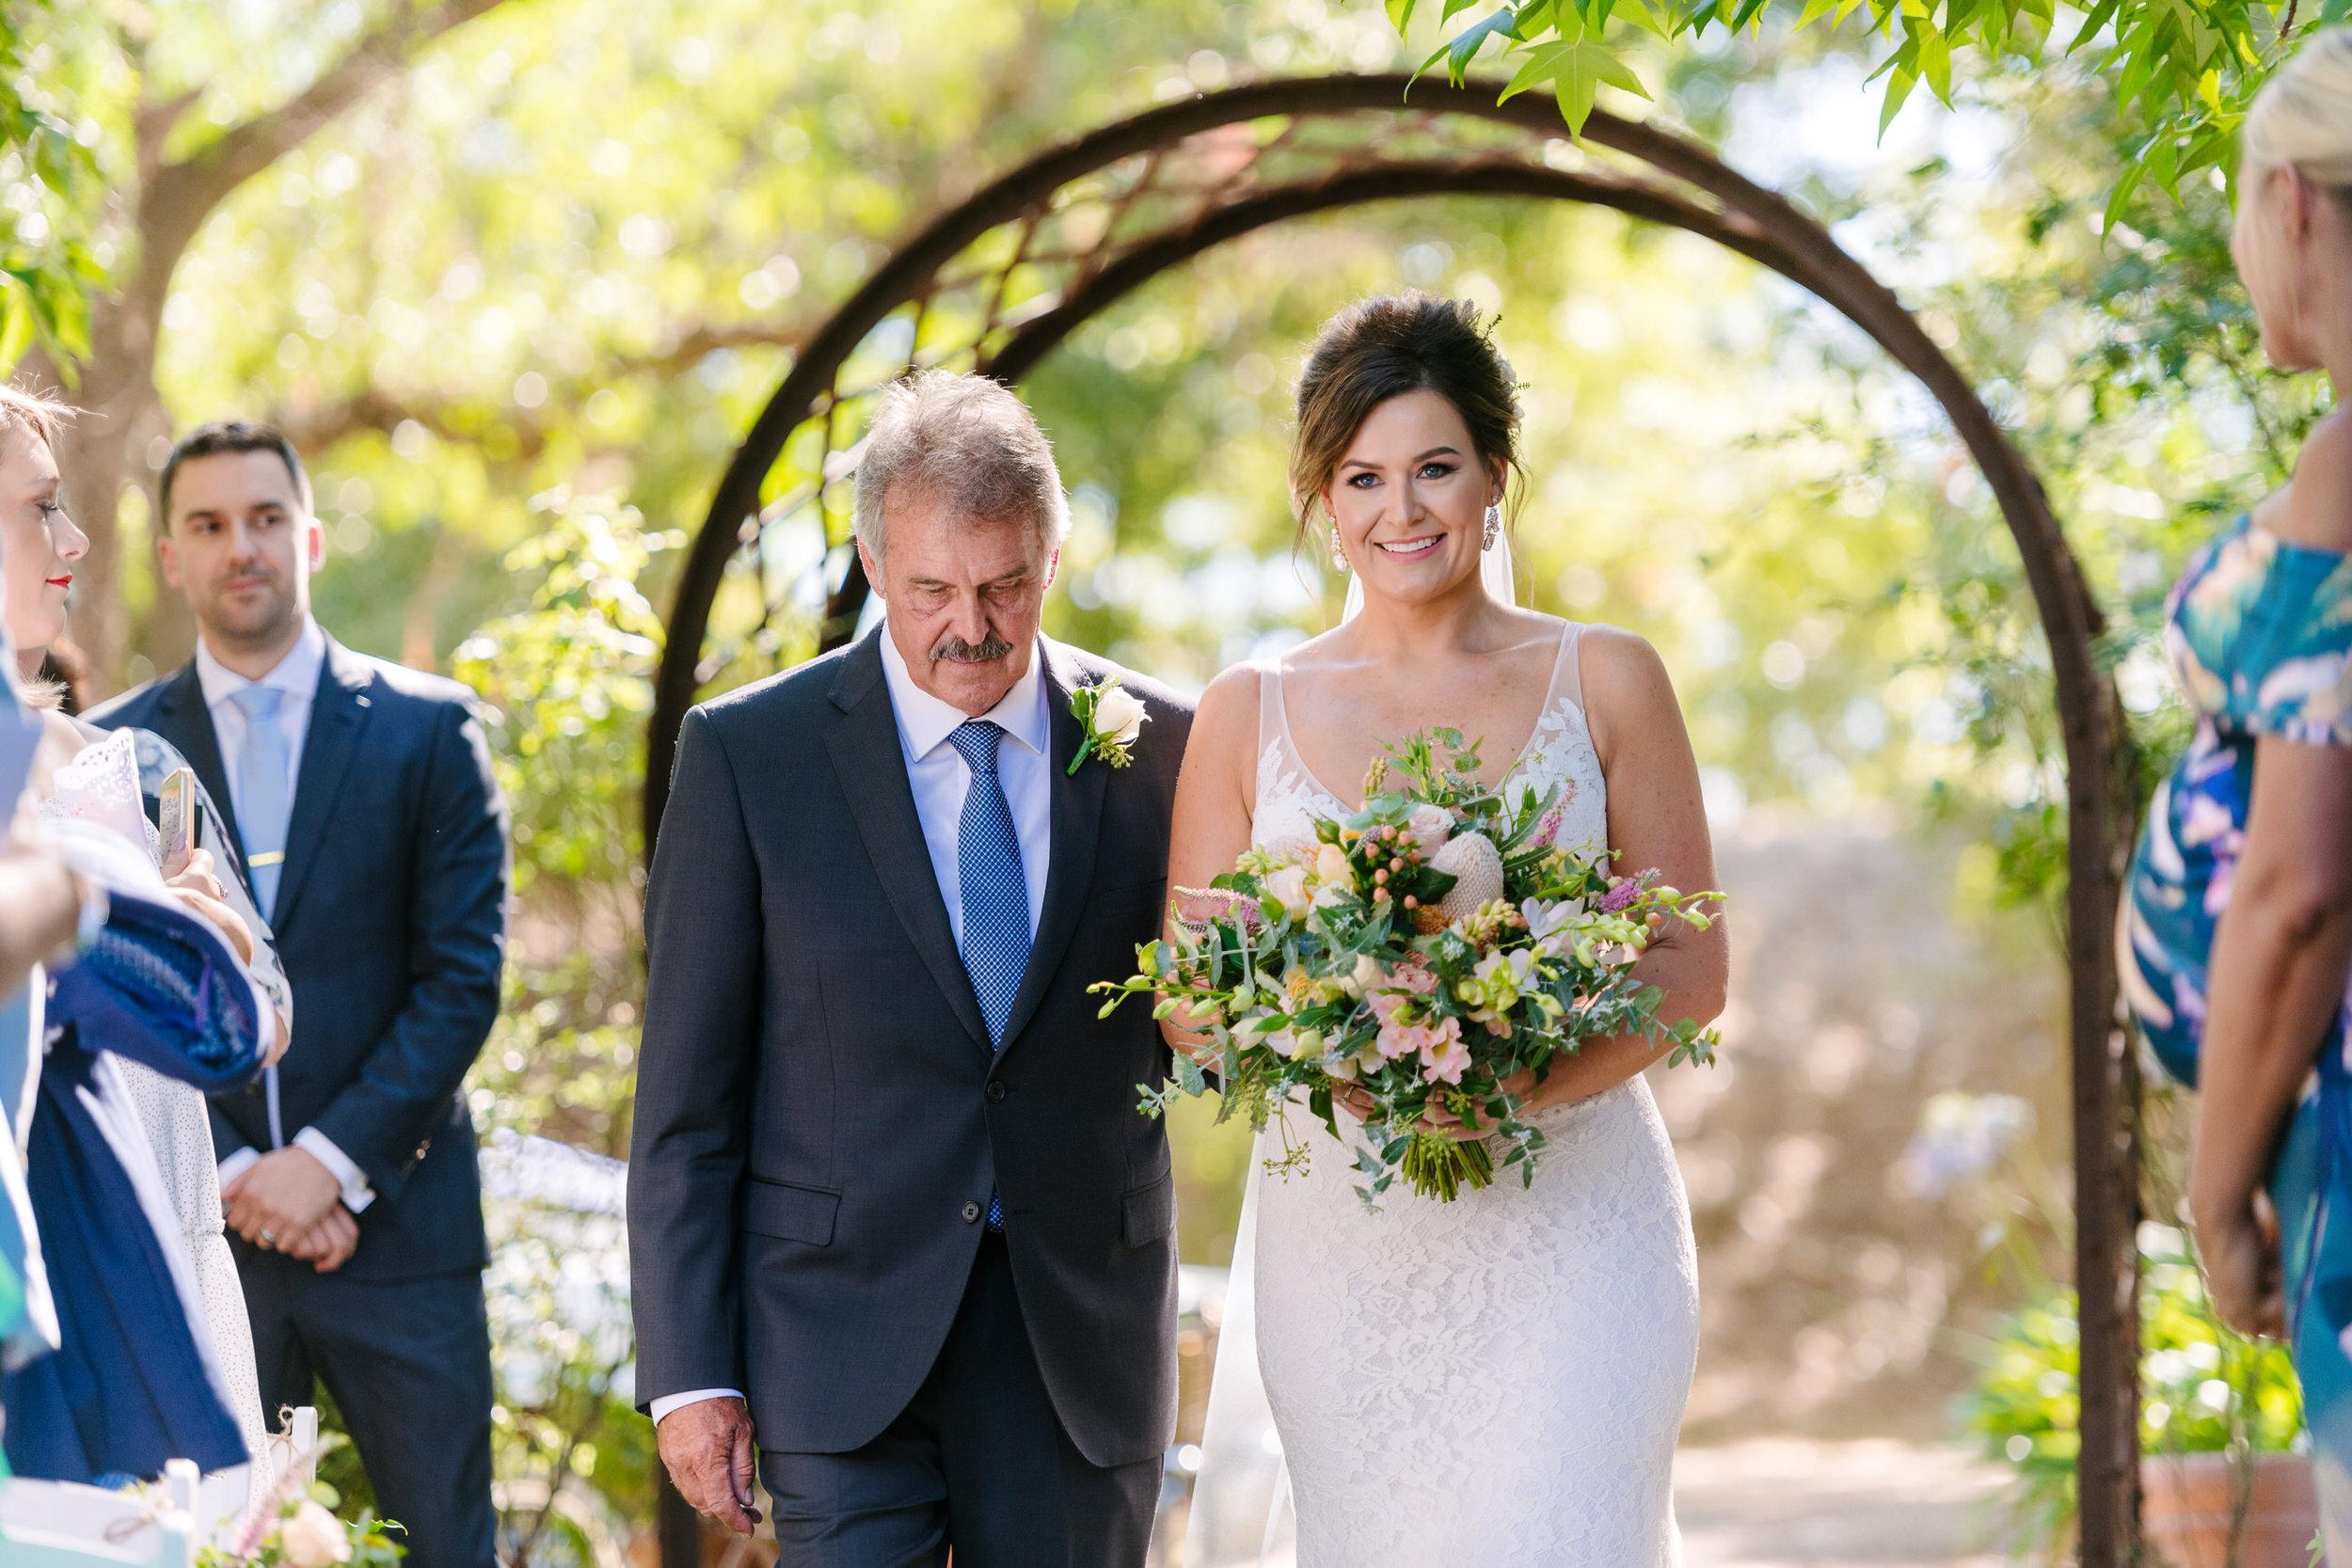 Justin_And_Jim_Photography_Chateau_Dore_Bendigo_Wedding30.JPG